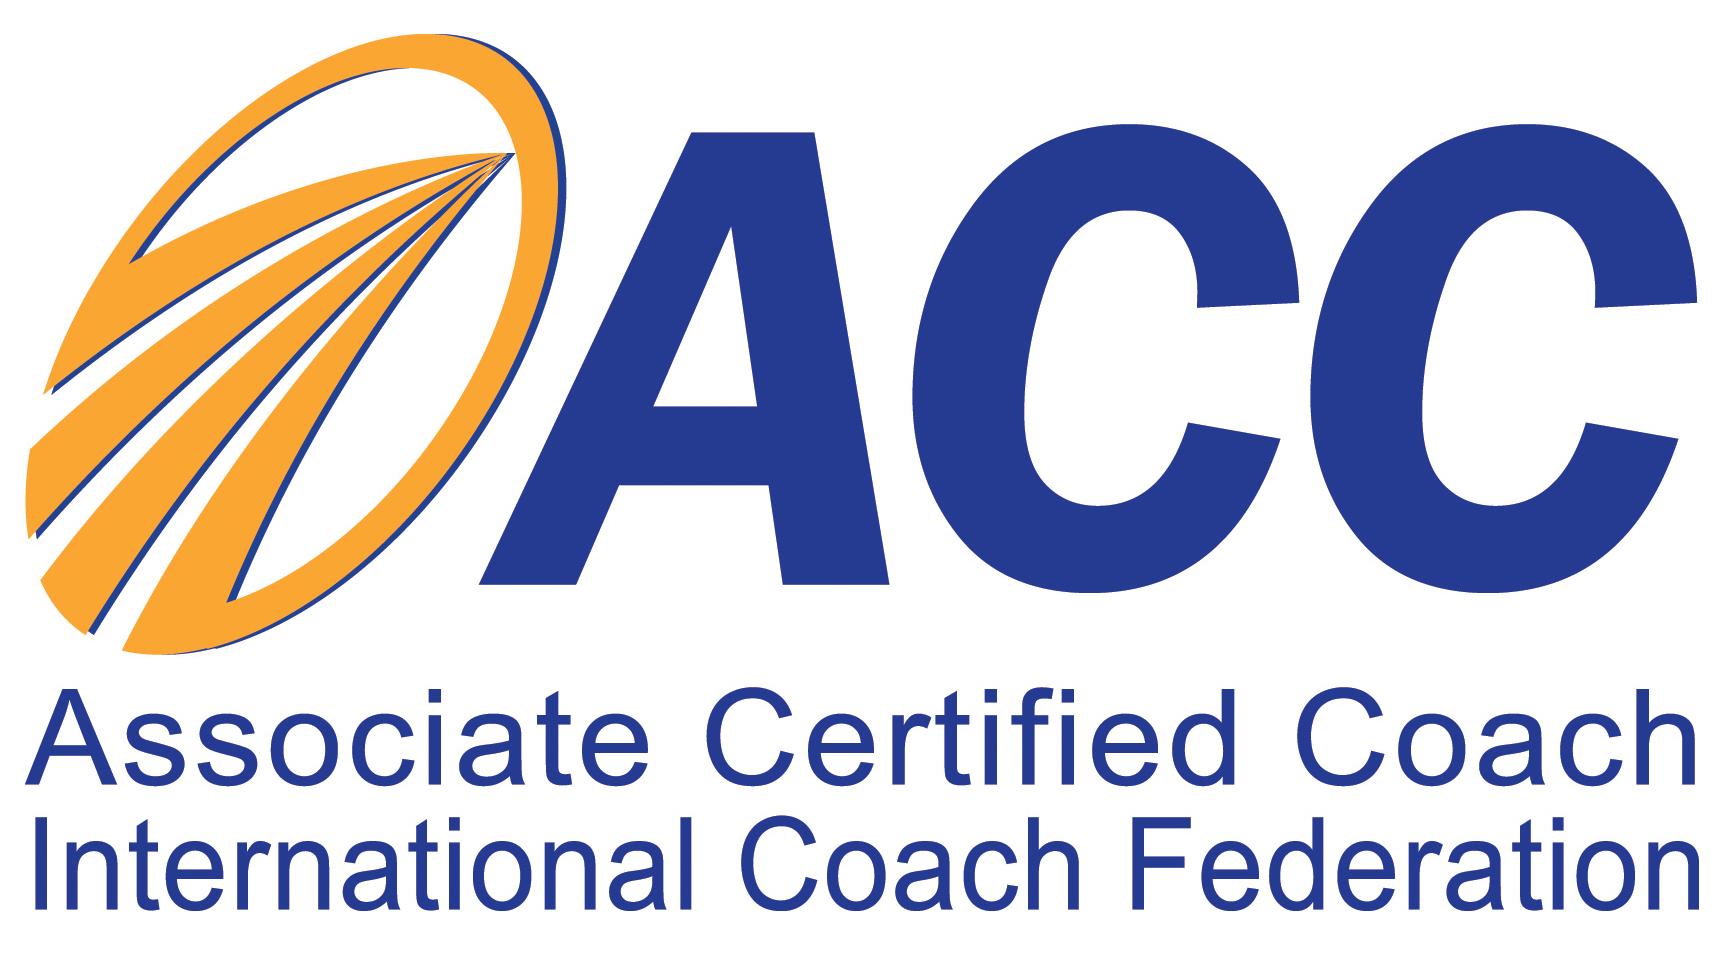 ICF ACC logo.jpg